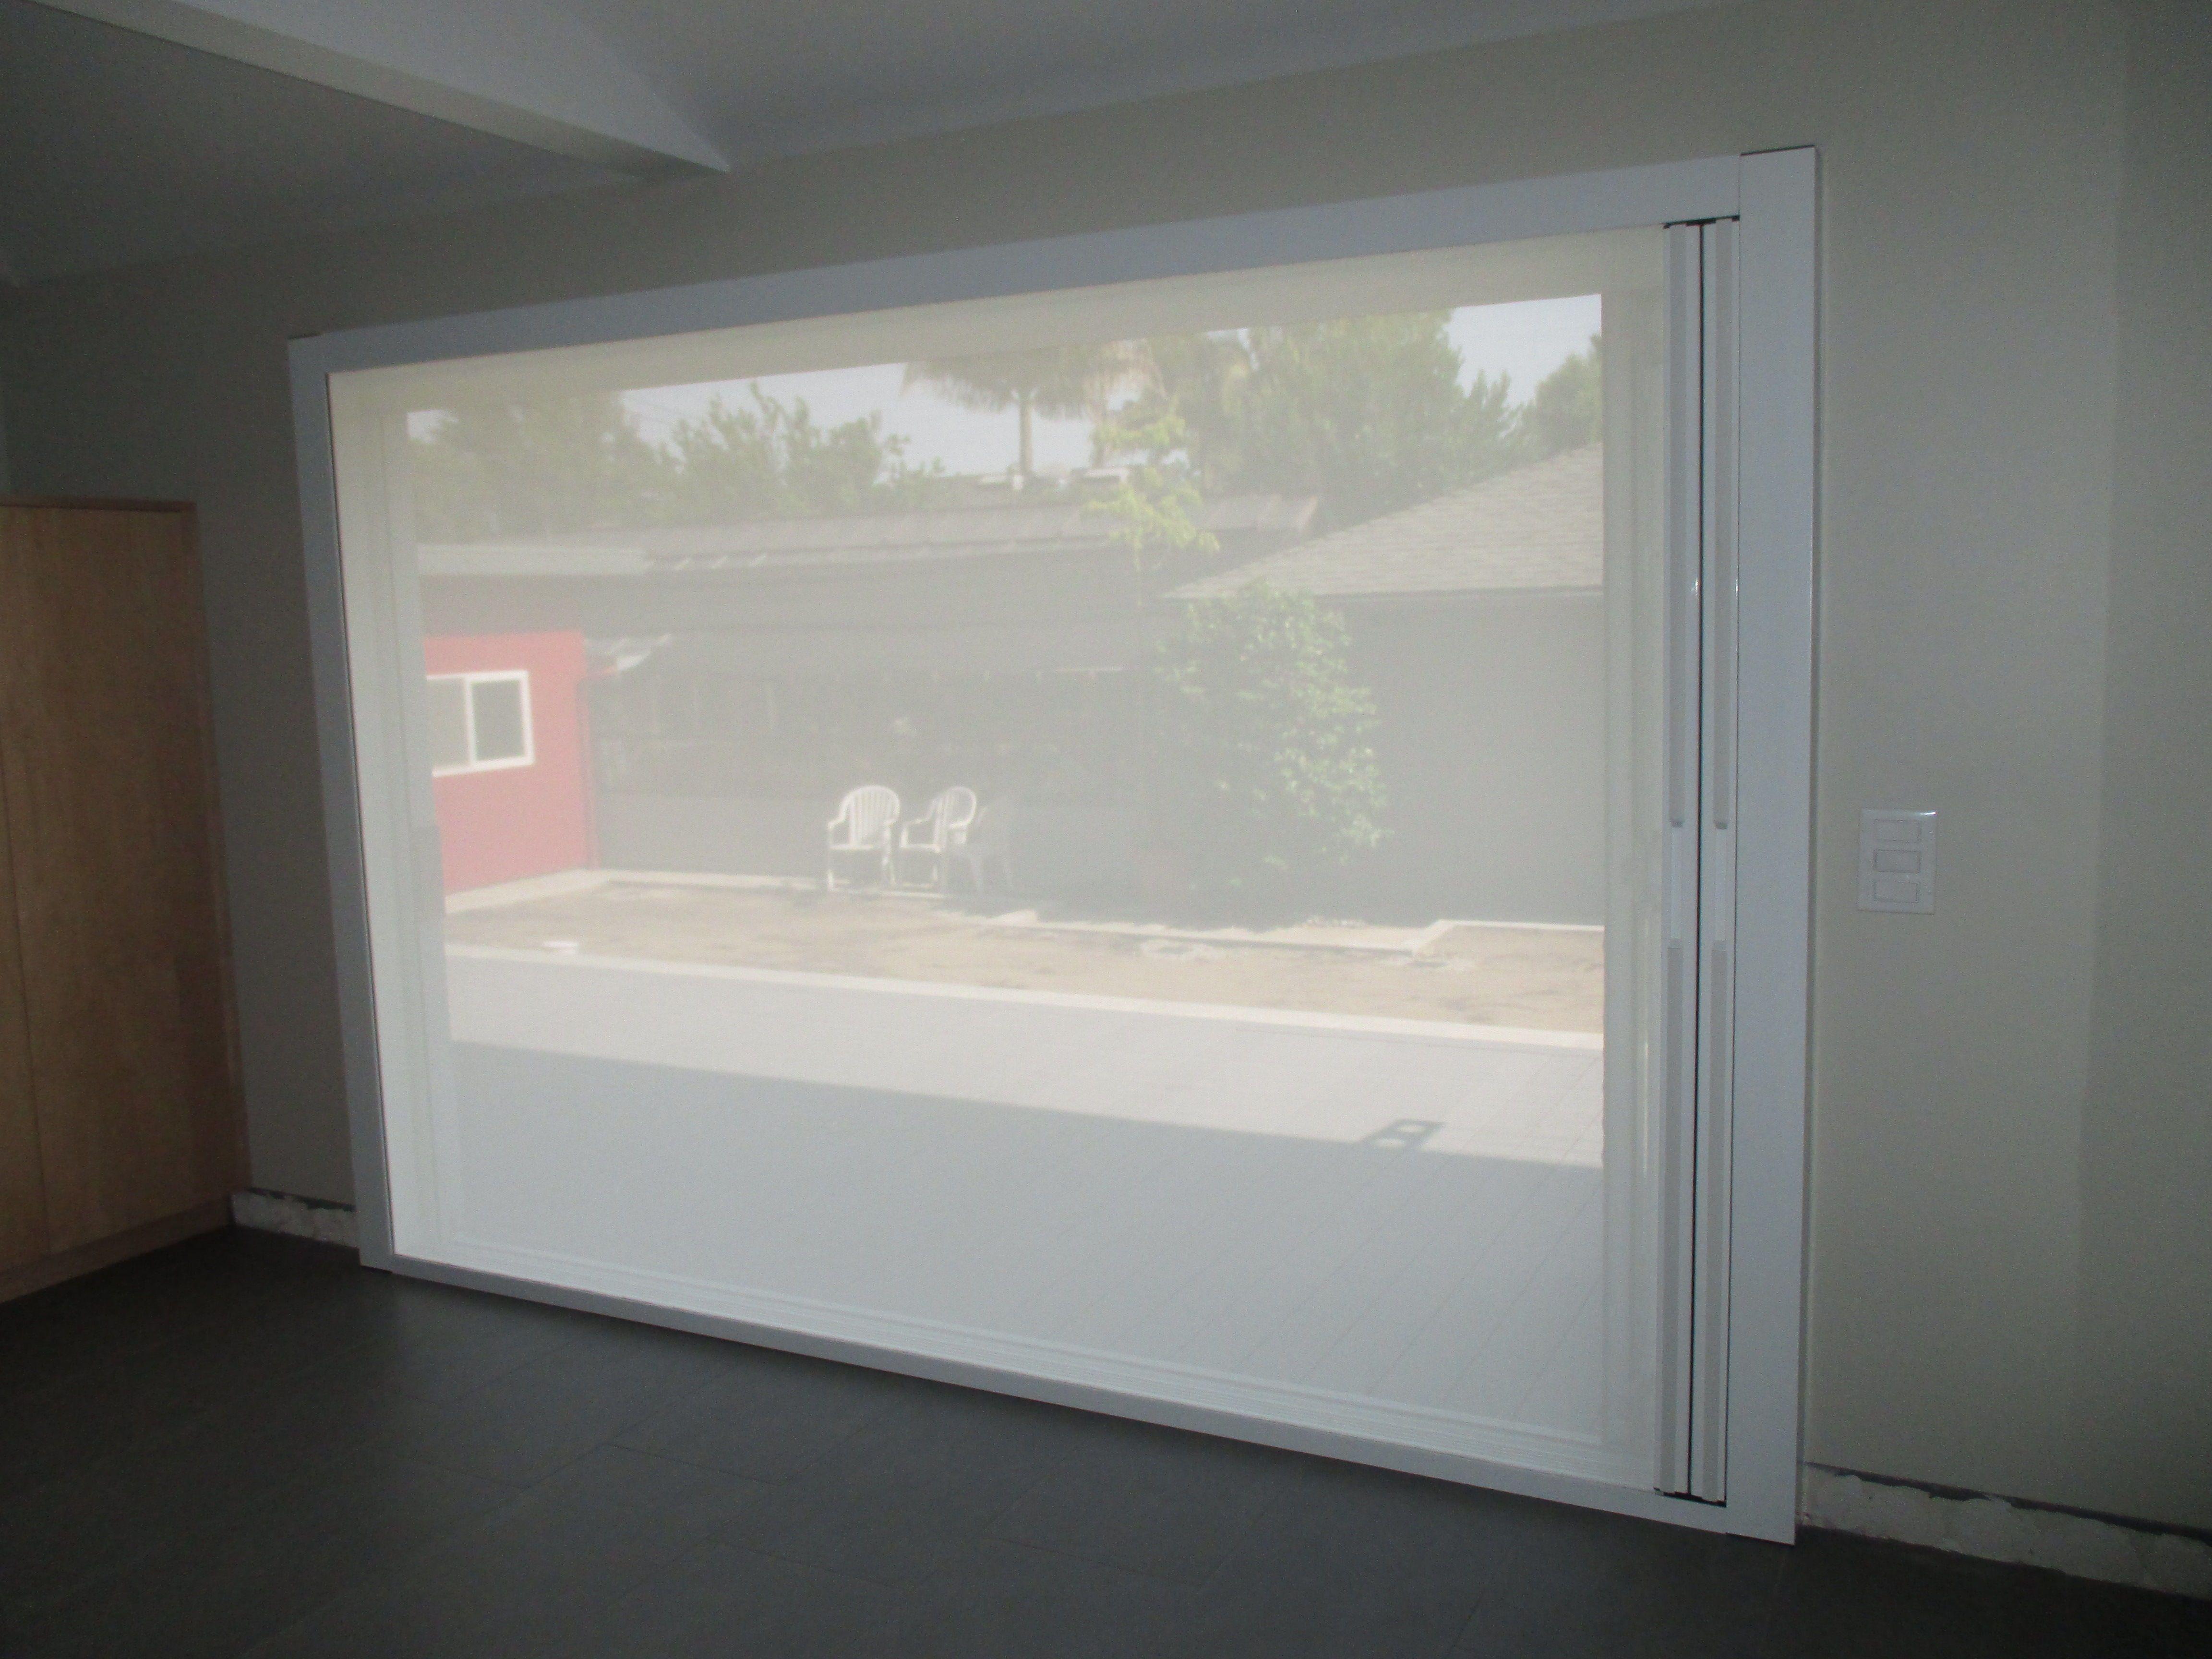 Closet Doors - Retractable Screen Doors | Classic Improvement Products & Our team did a unique installation of a double door Centor Screen ...